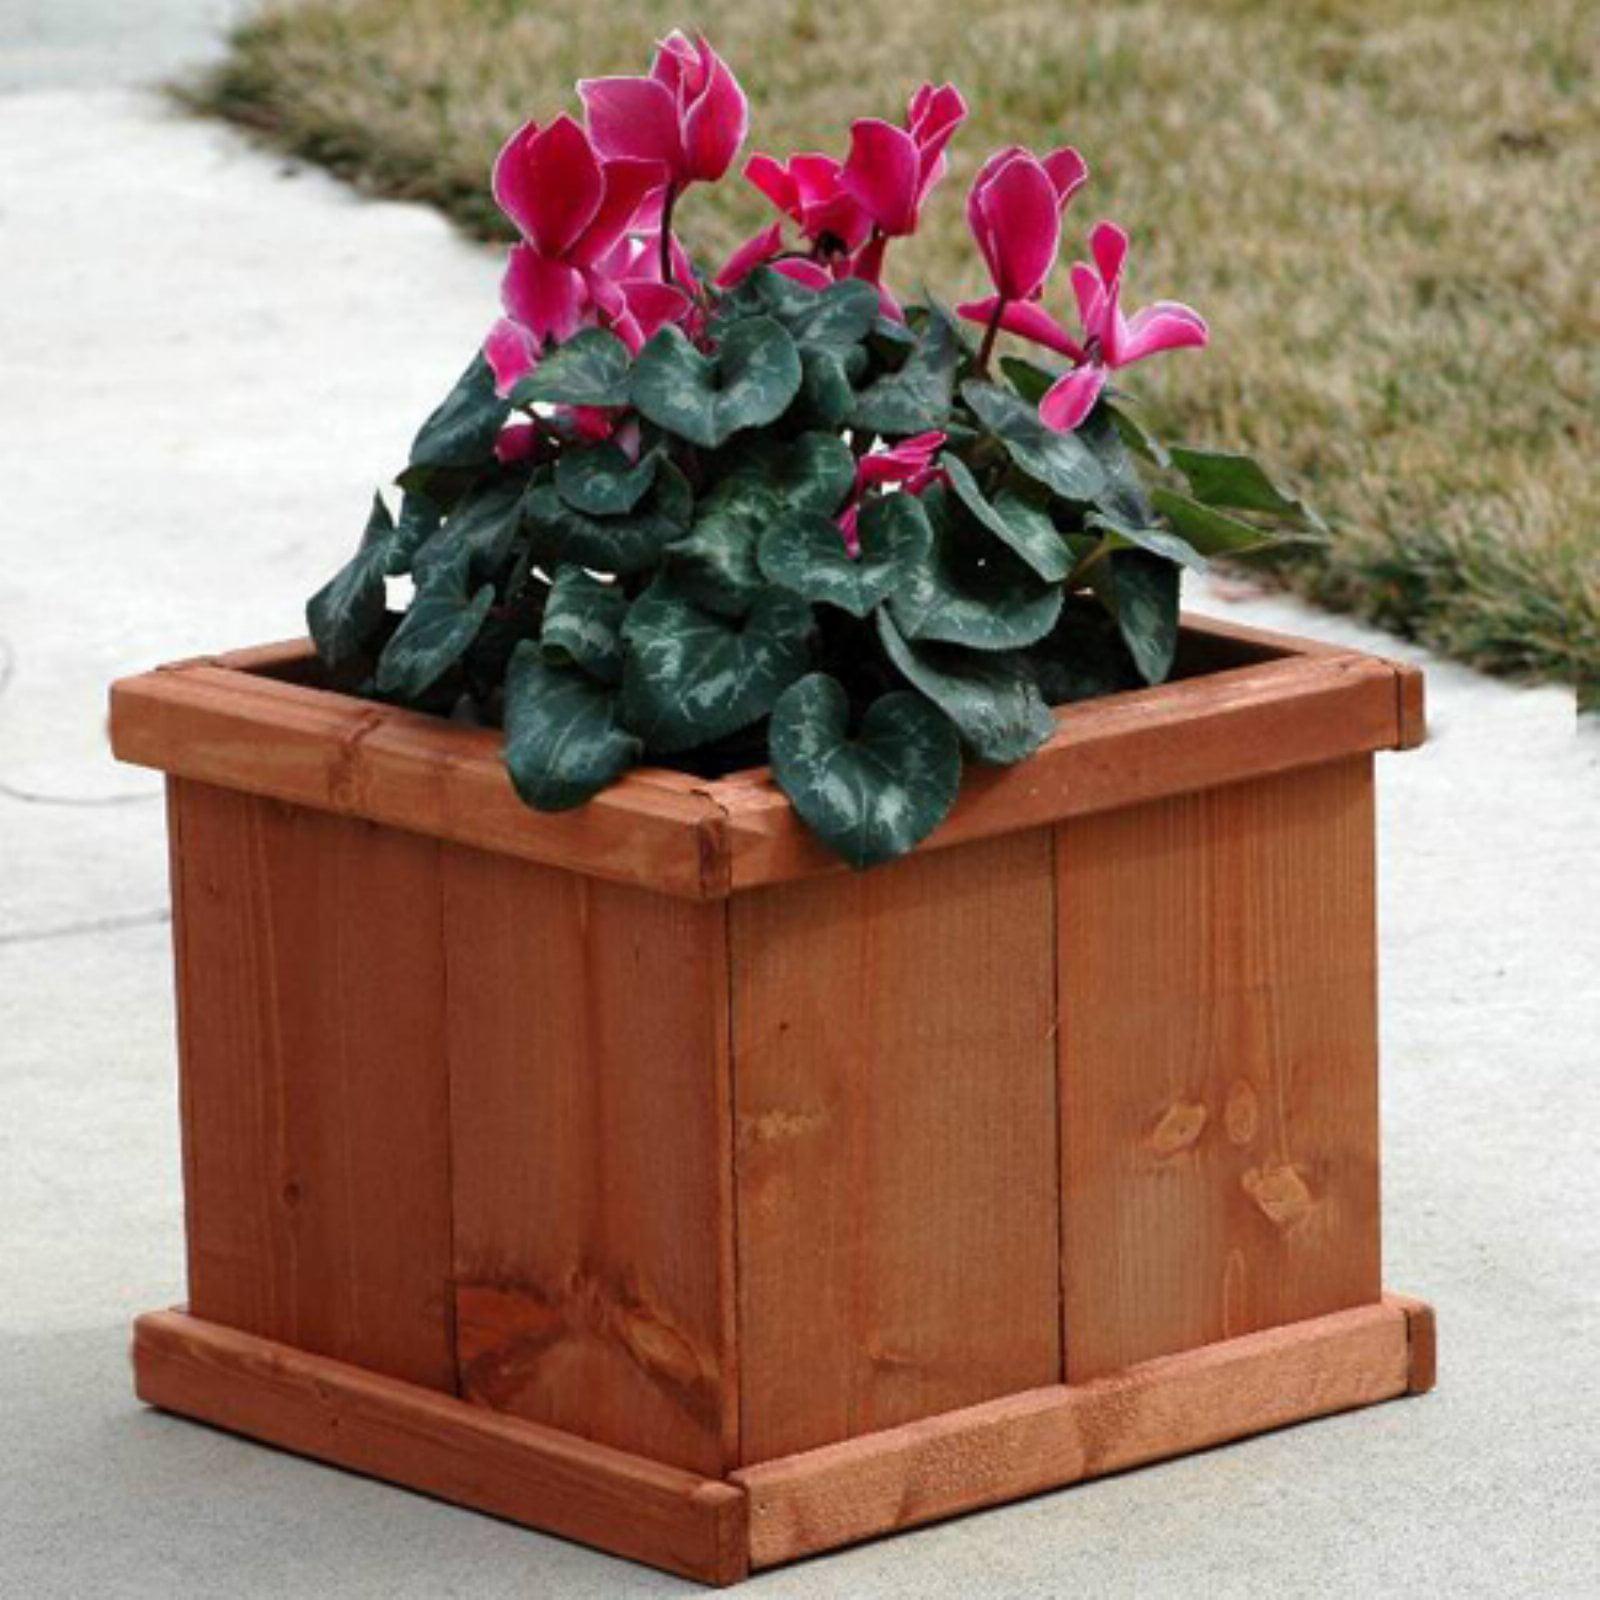 Greenstone Latte Square Cedar Planter - Walmart.com